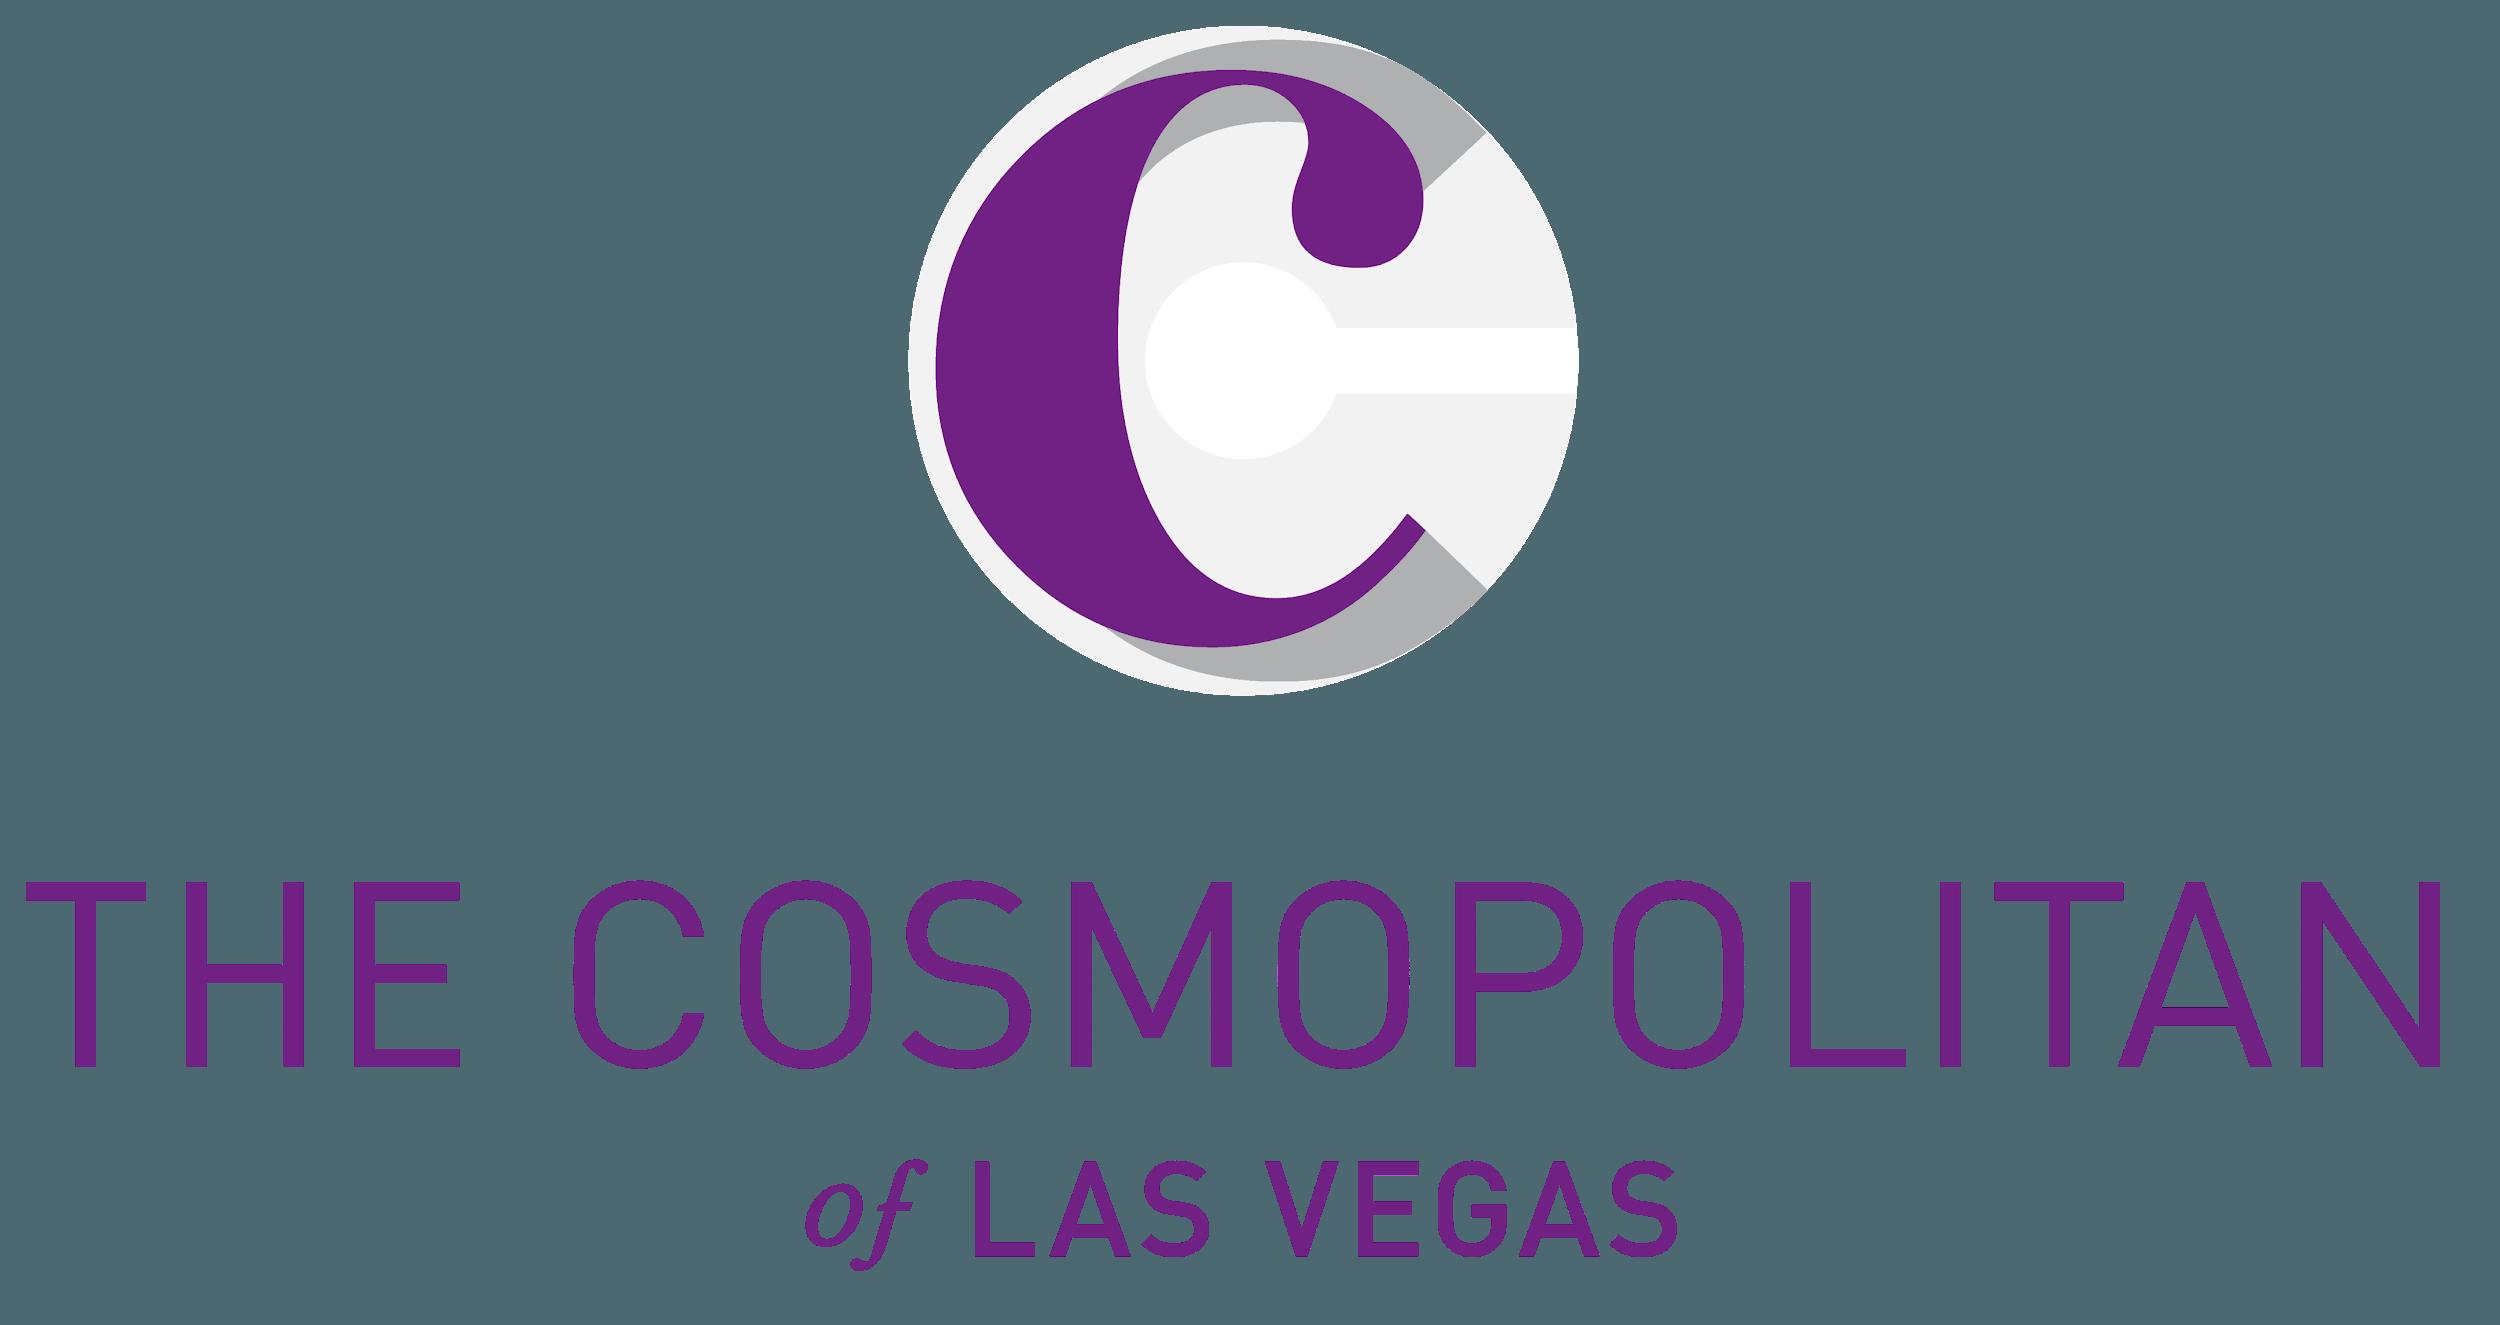 The Cosmopolitan Las Vegas logo